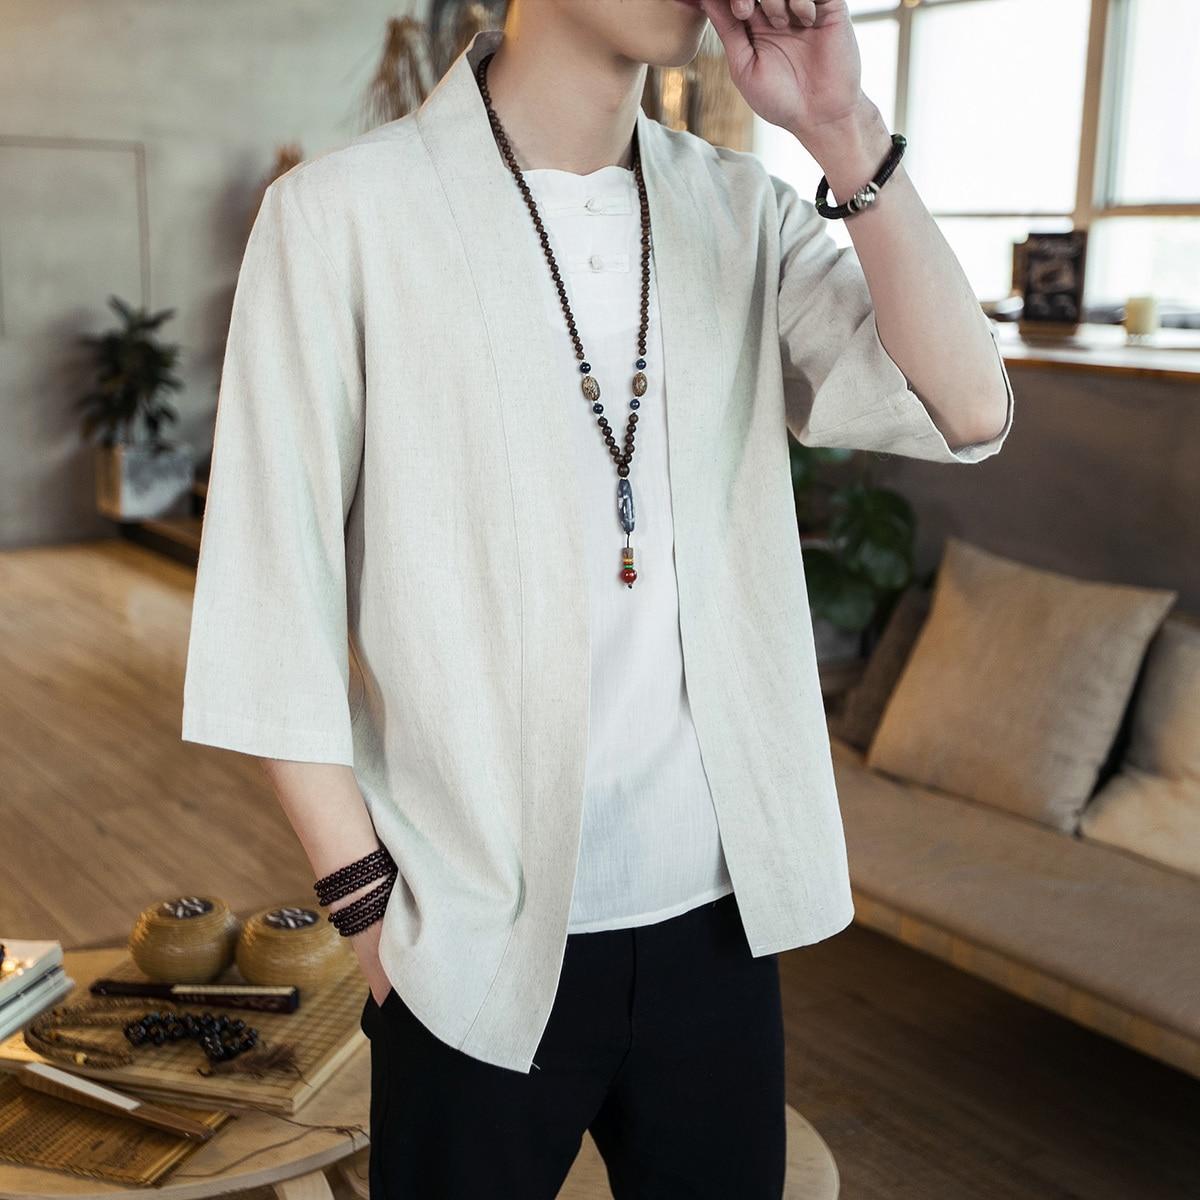 2019 Mens Kimono Japanese Clothes Streetwear Casual Kimonos Jackets Waves And Wind Dragn Harajuku Style Cardigan Outwear